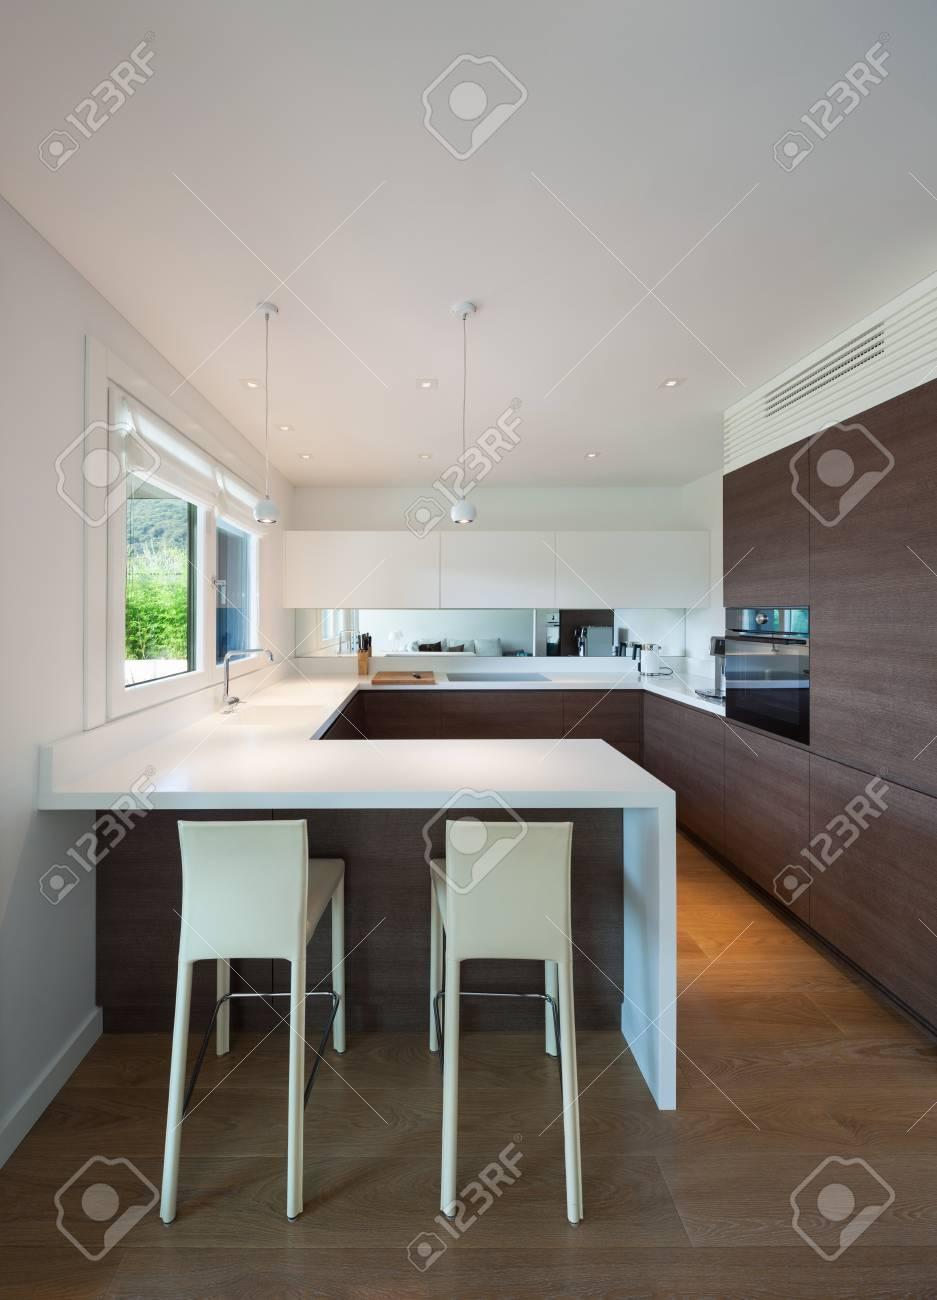 Interieur Cuisine Moderne | Grand Design Intérieur Cuisine Moderne